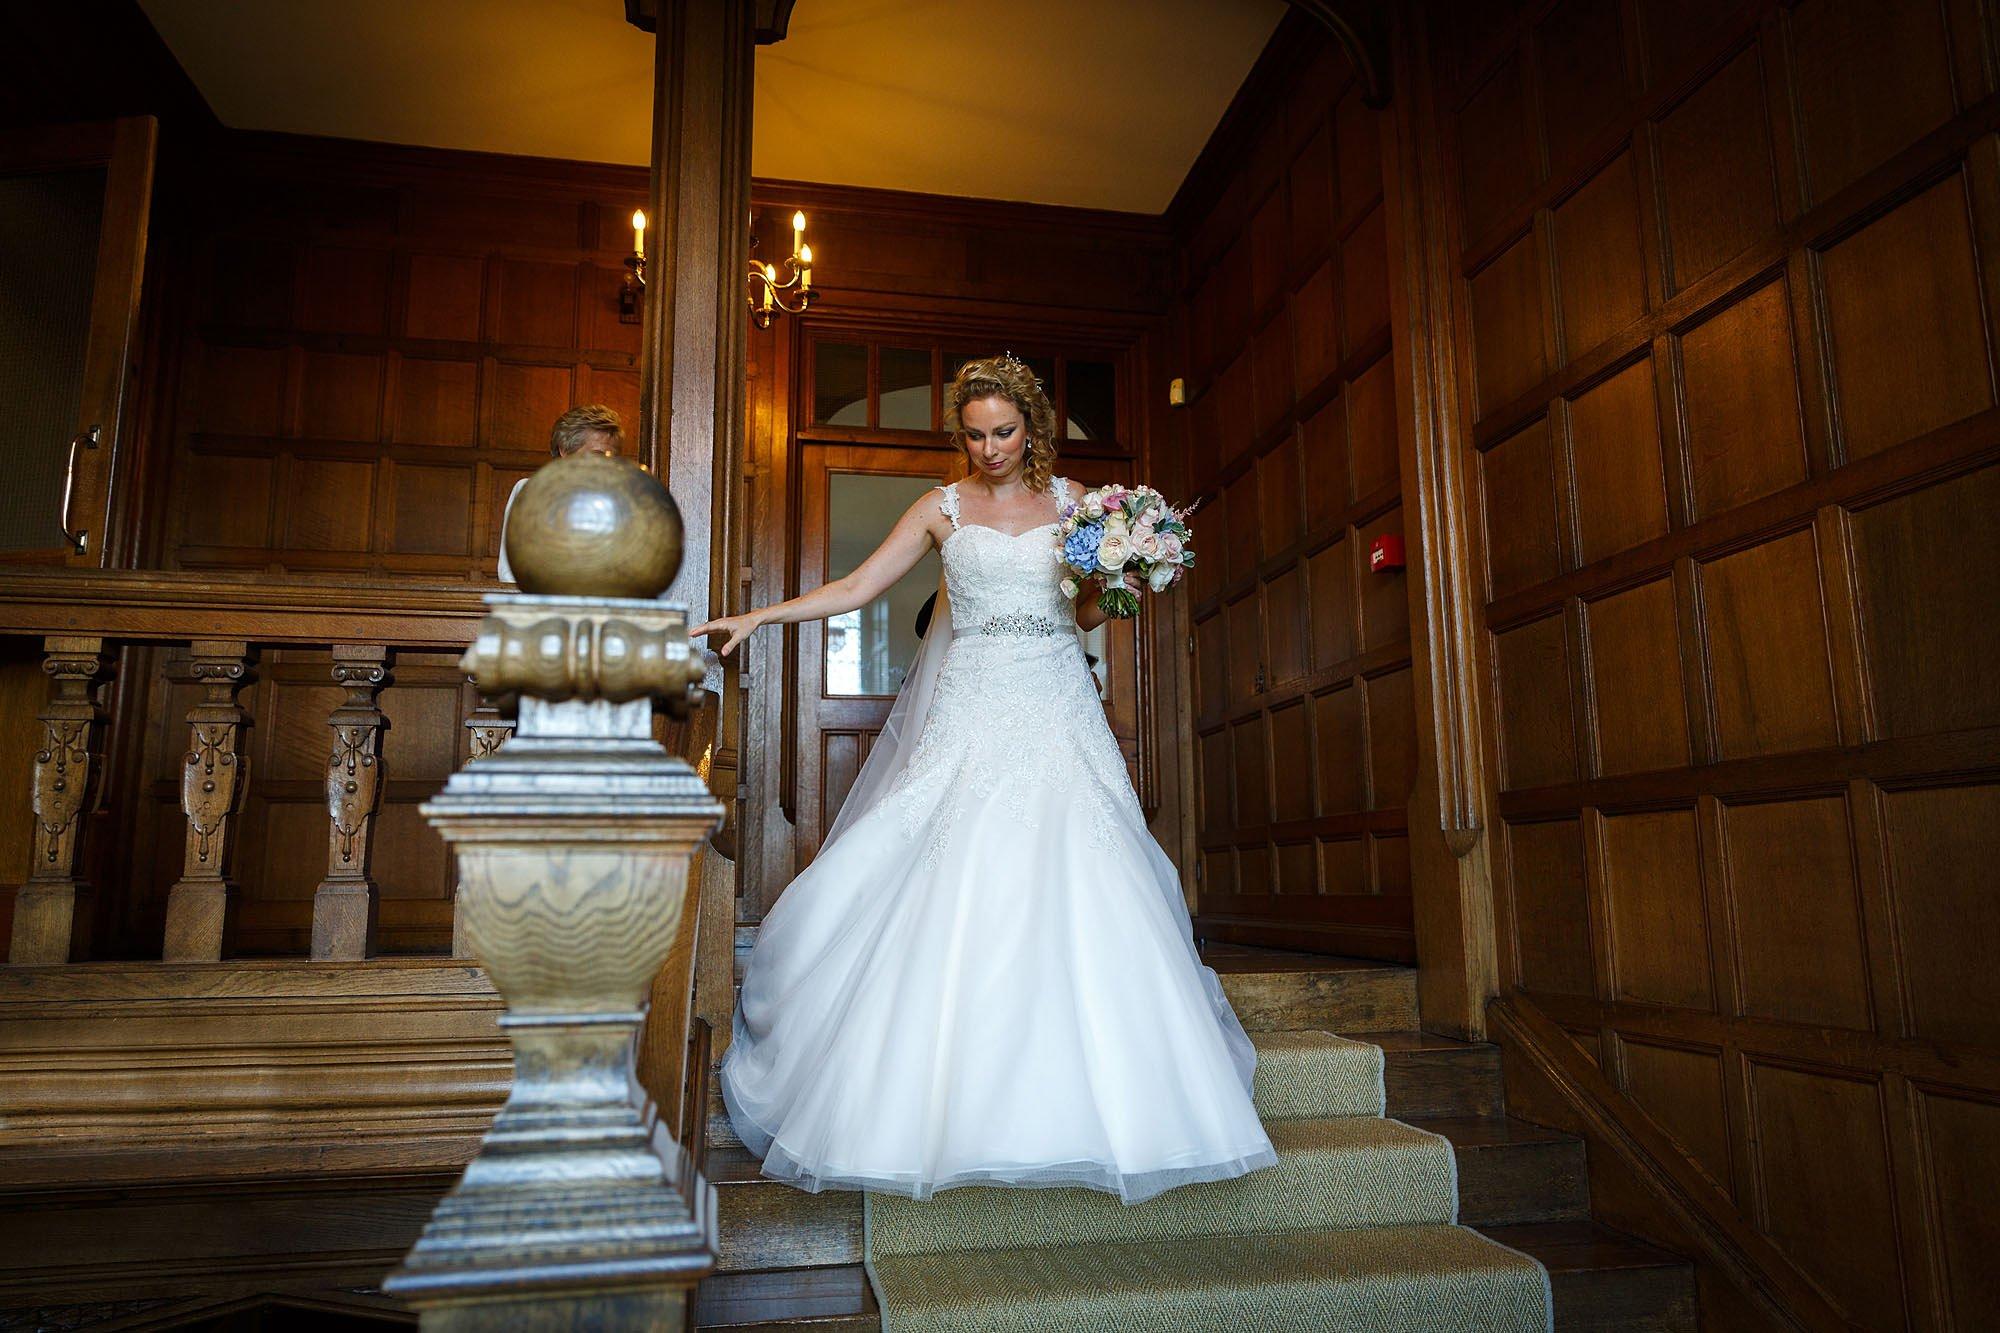 Hengrave wedding photos